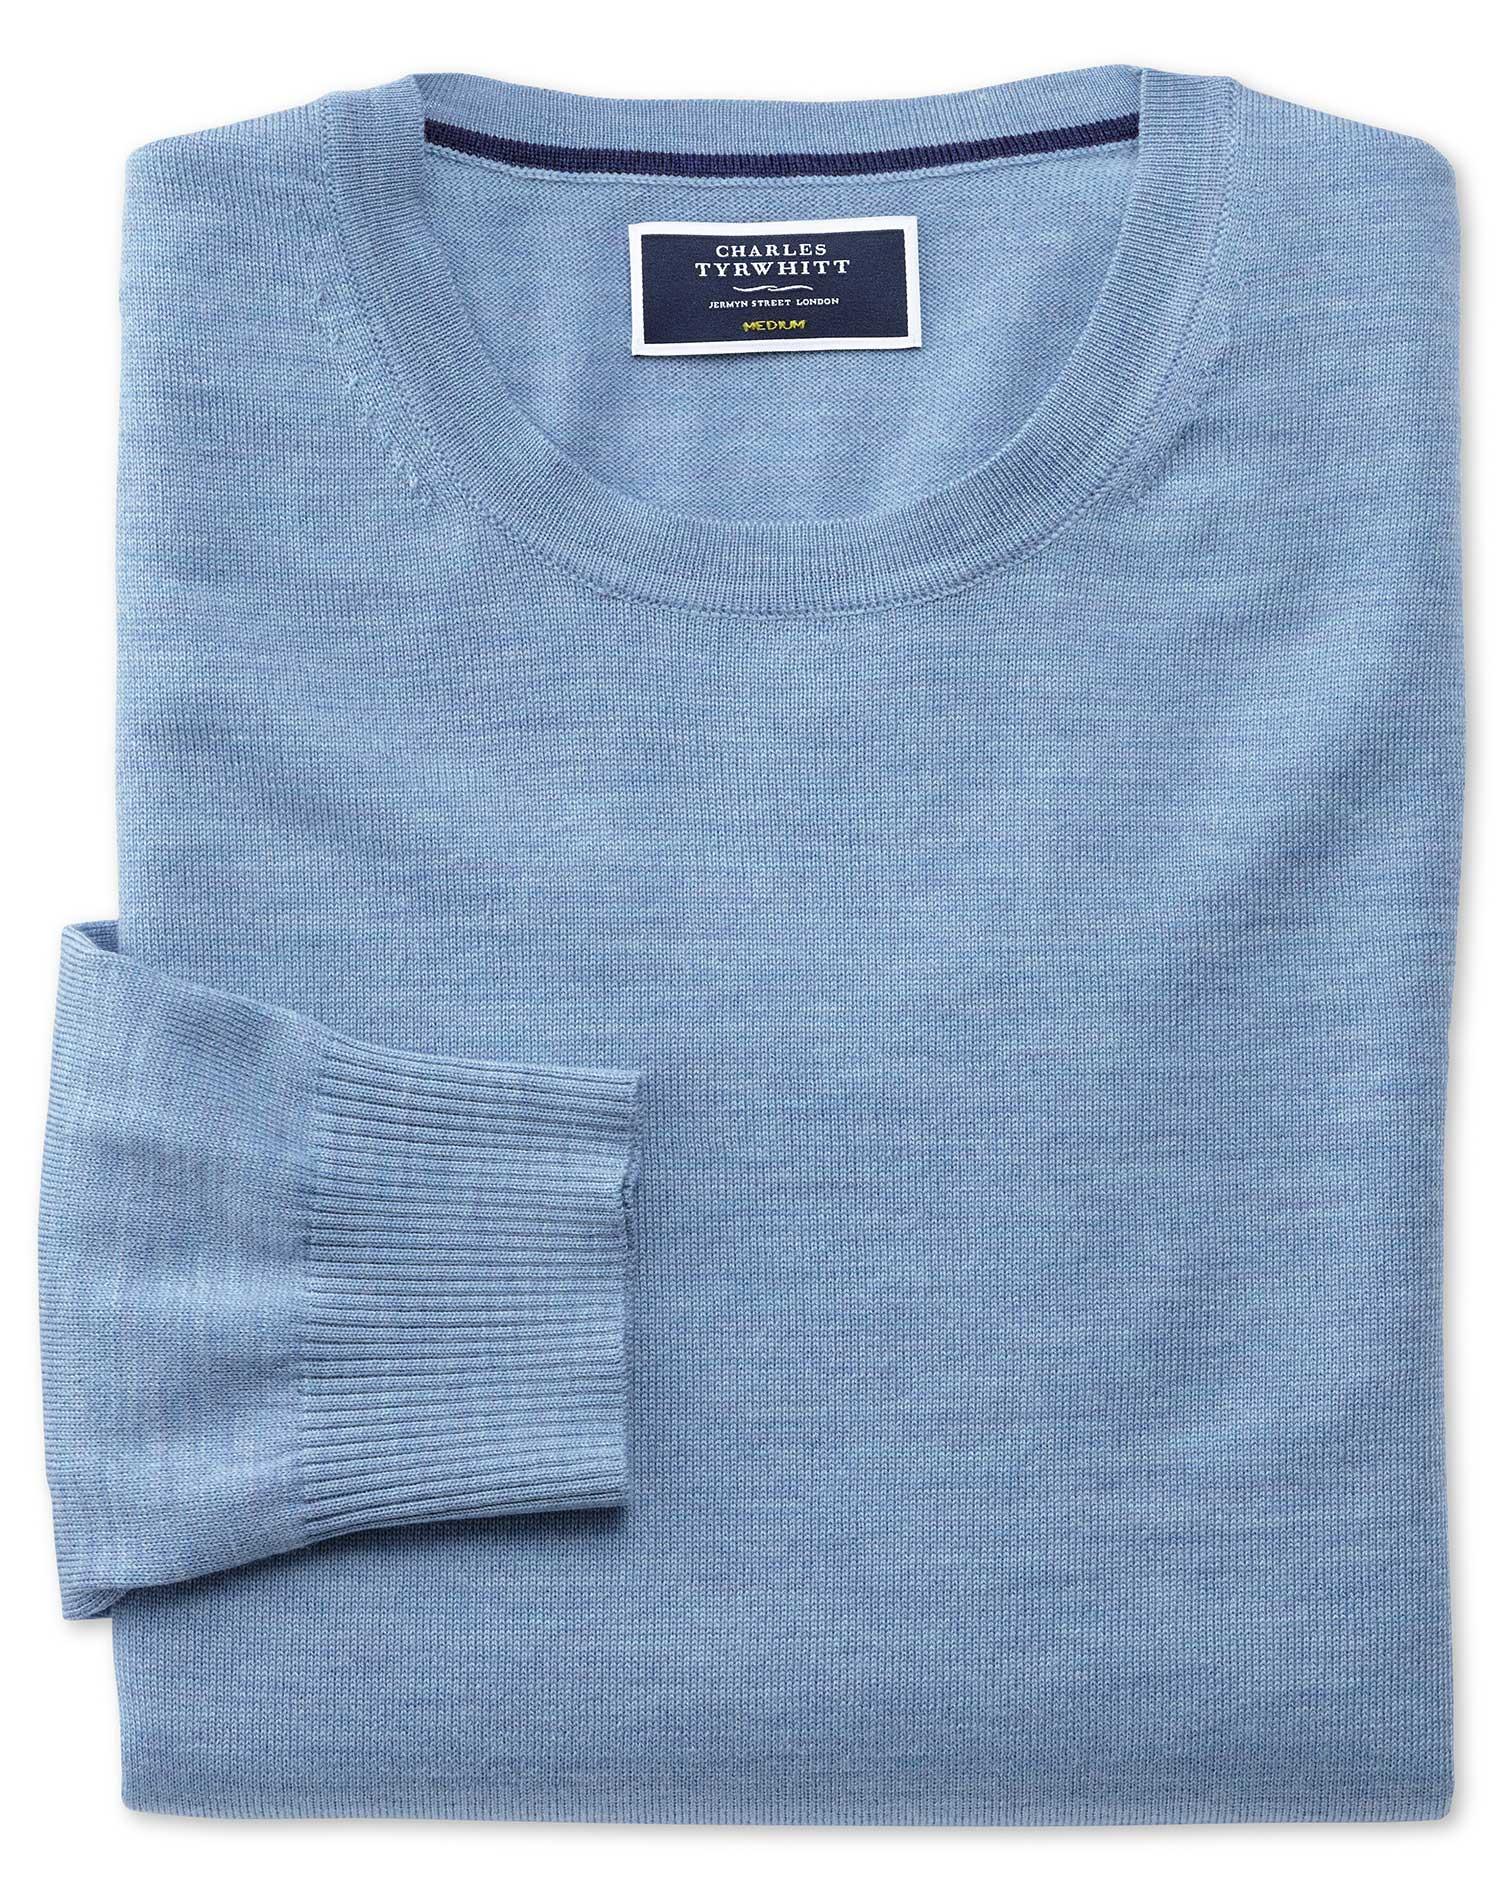 Sky Merino Wool Crew Neck Jumper Size XL by Charles Tyrwhitt